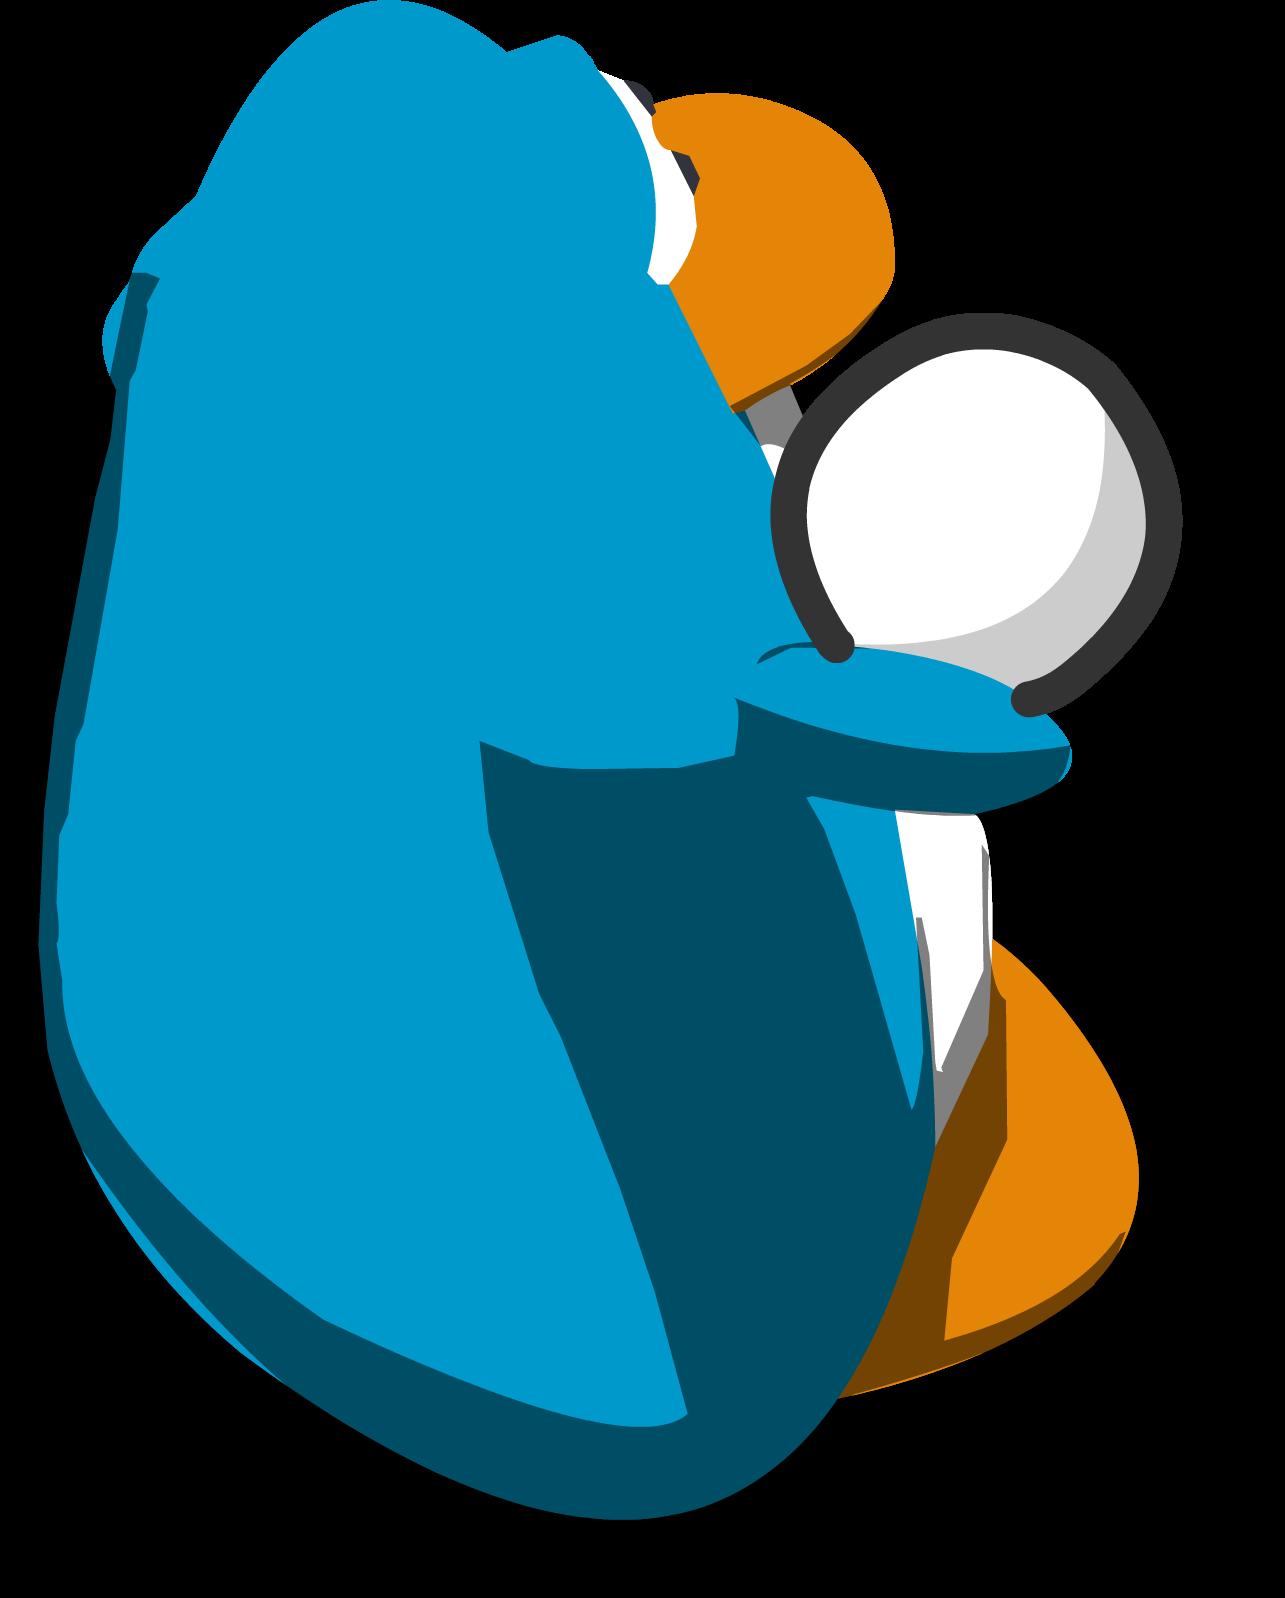 penguin club penguin wiki fandom powered by wikia